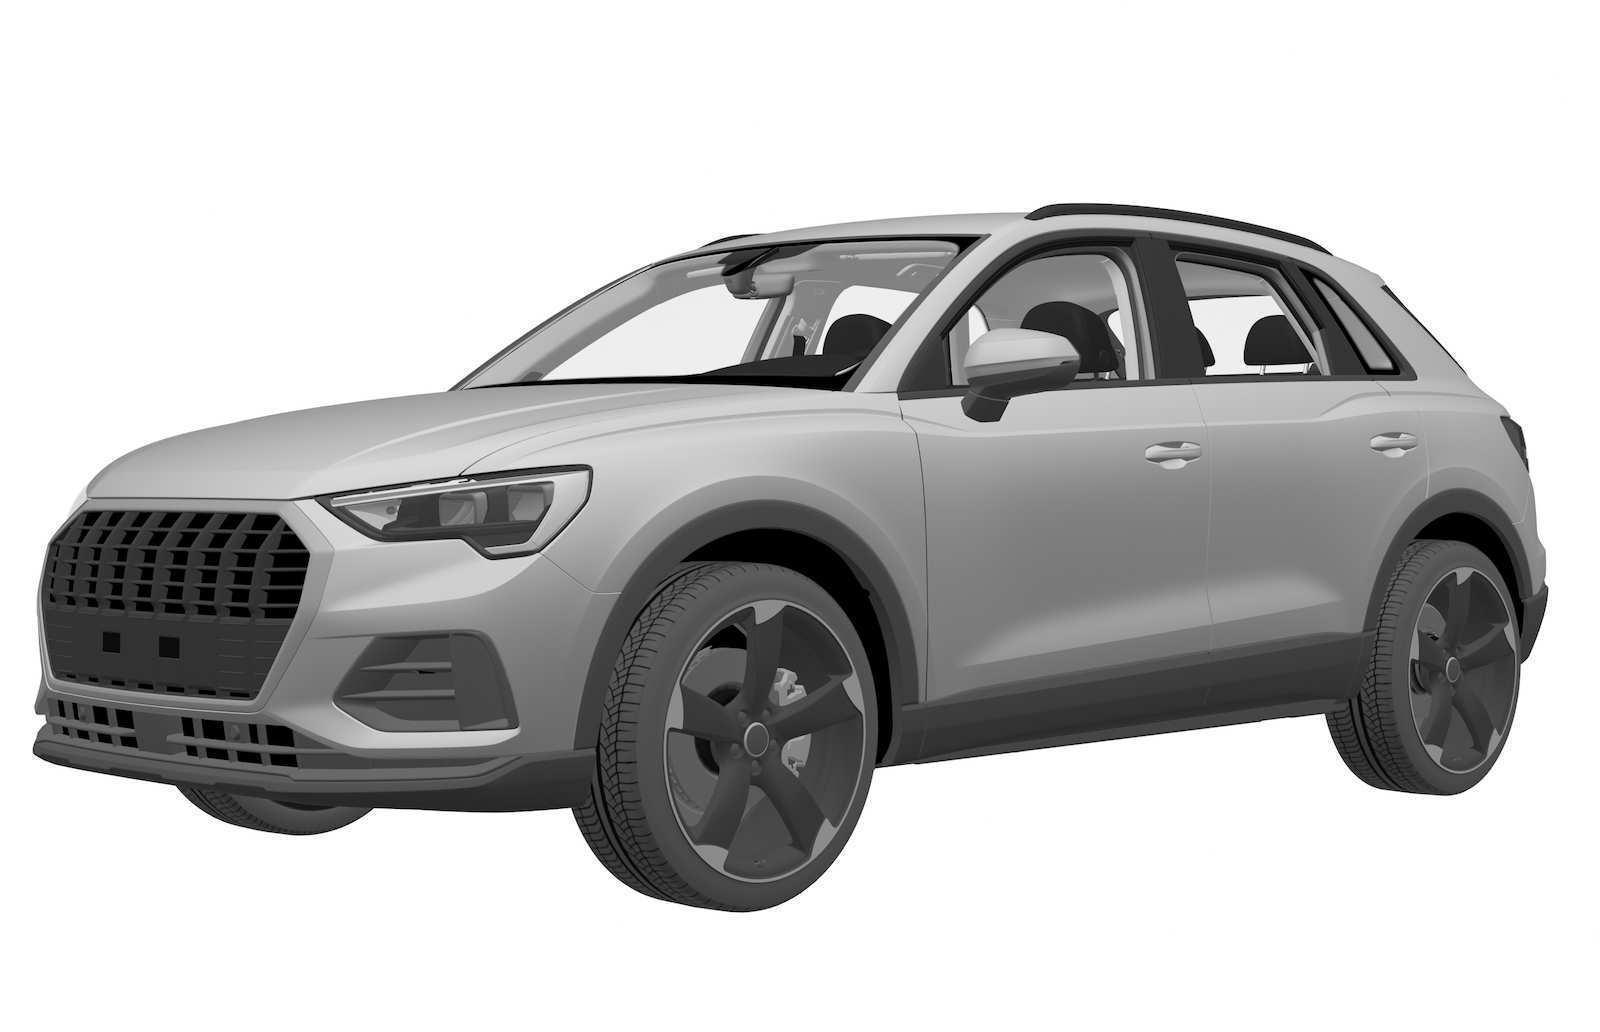 95 Concept of Audi Hybrid 2020 History for Audi Hybrid 2020